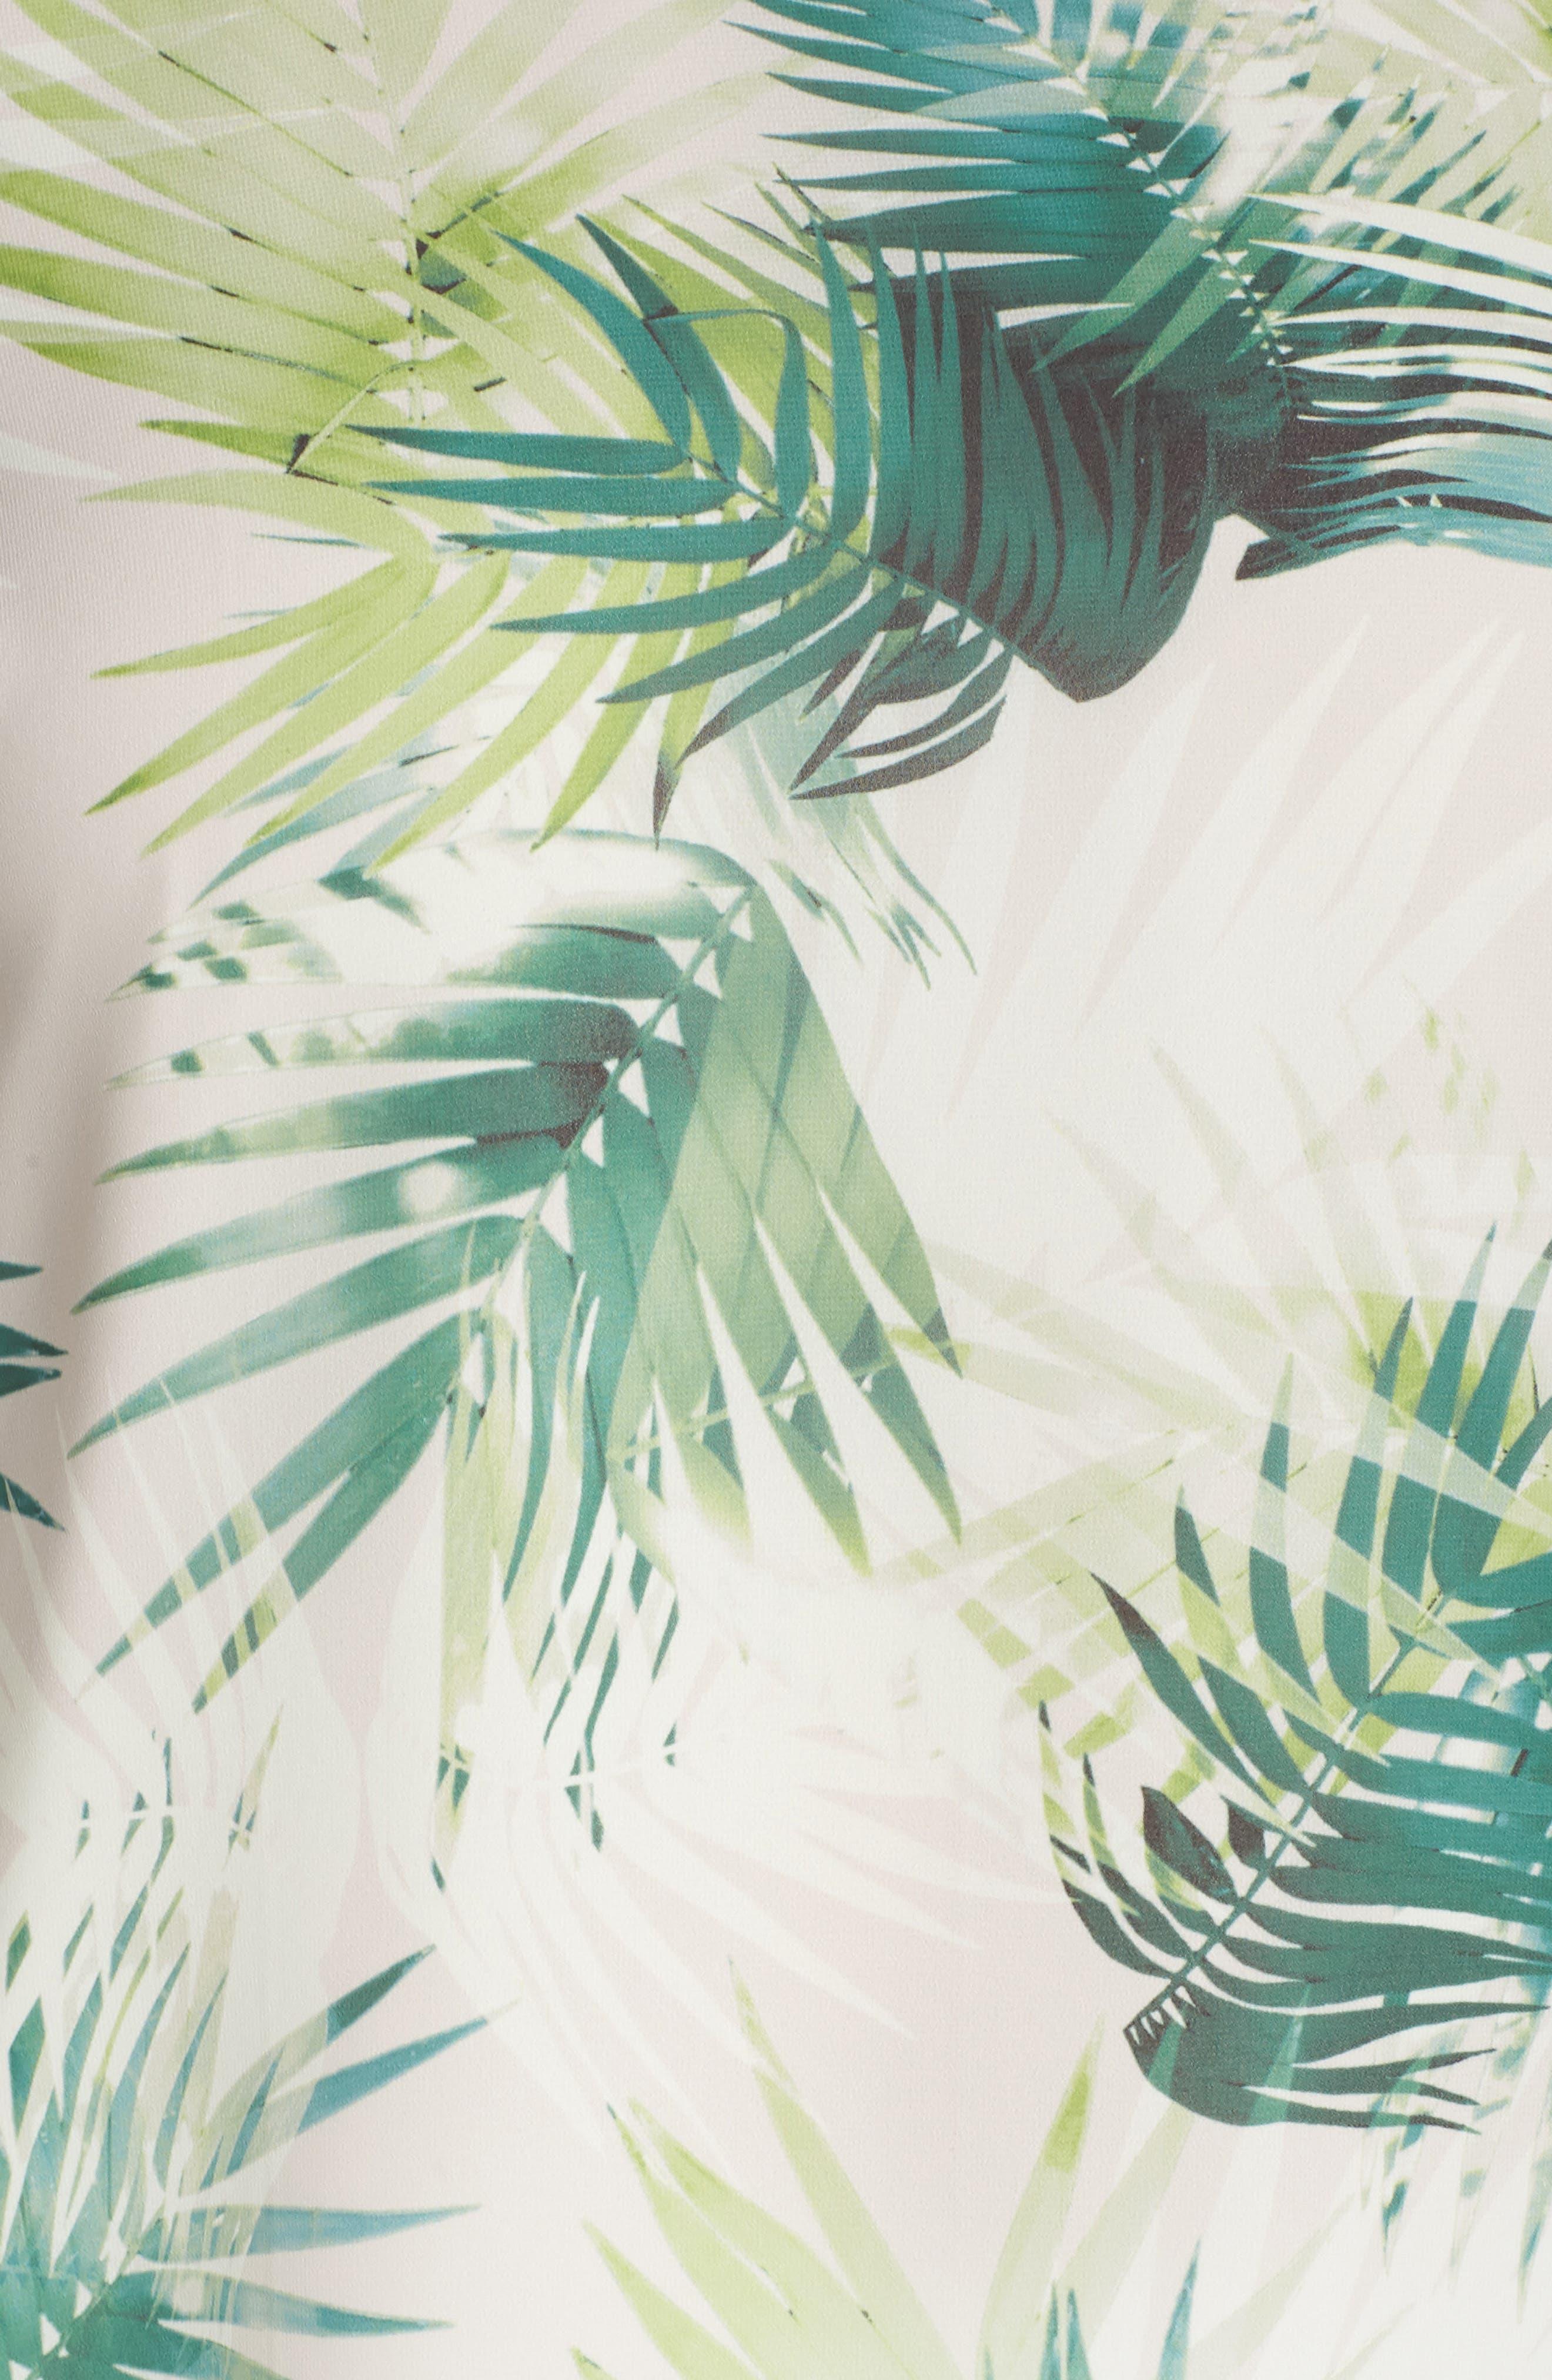 Drawstring Sleeve Sunlit Palm Print Top,                             Alternate thumbnail 6, color,                             Verdant Green